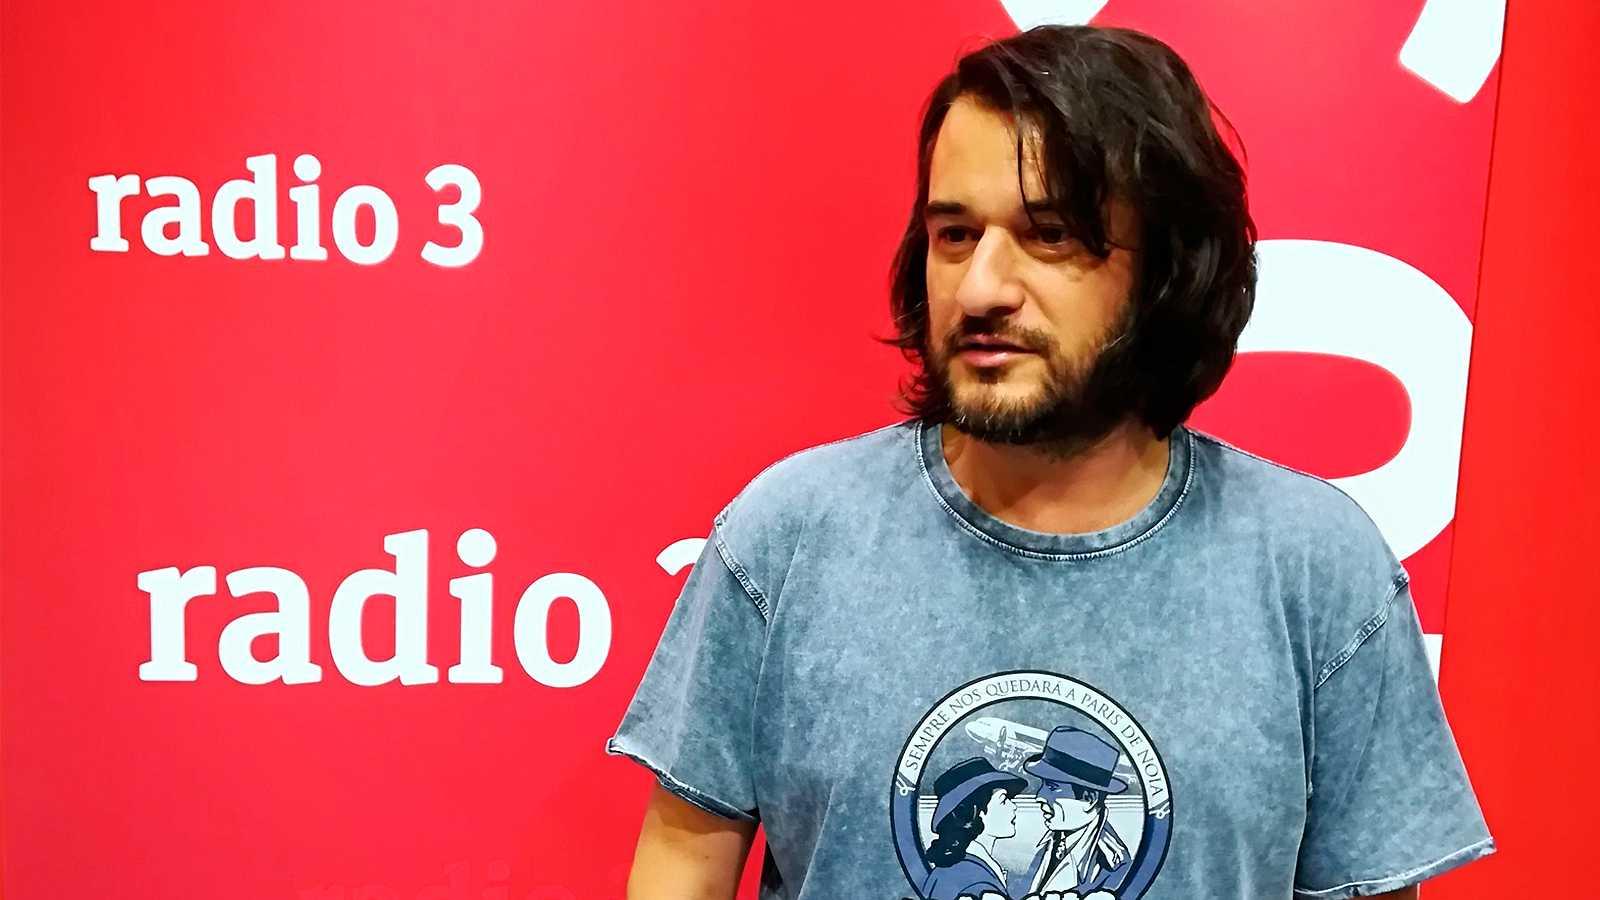 Efecto Doppler - 'Malaherba' con Manuel Jabois - 22/05/19 - escuchar ahora